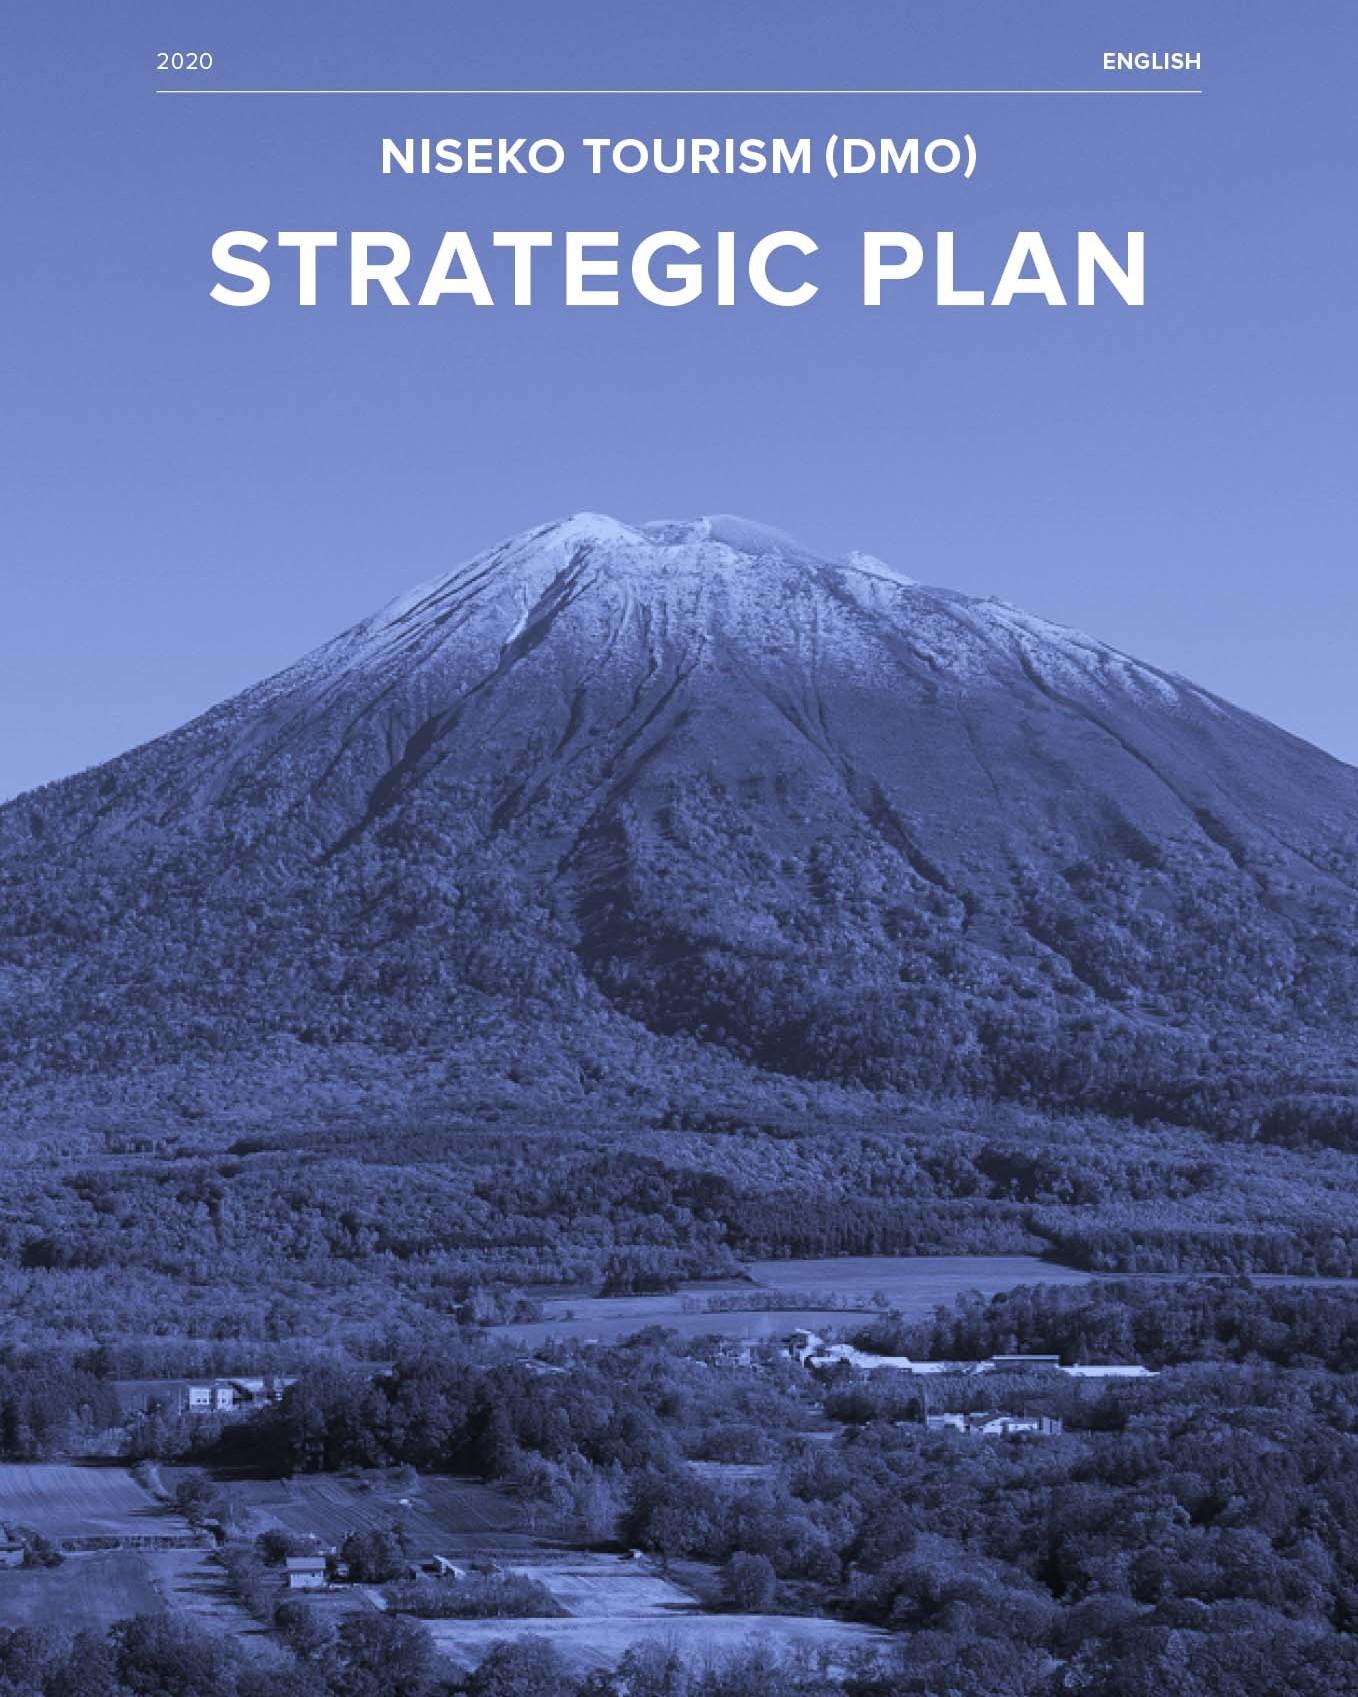 Niseko Tourism Strategy Plan